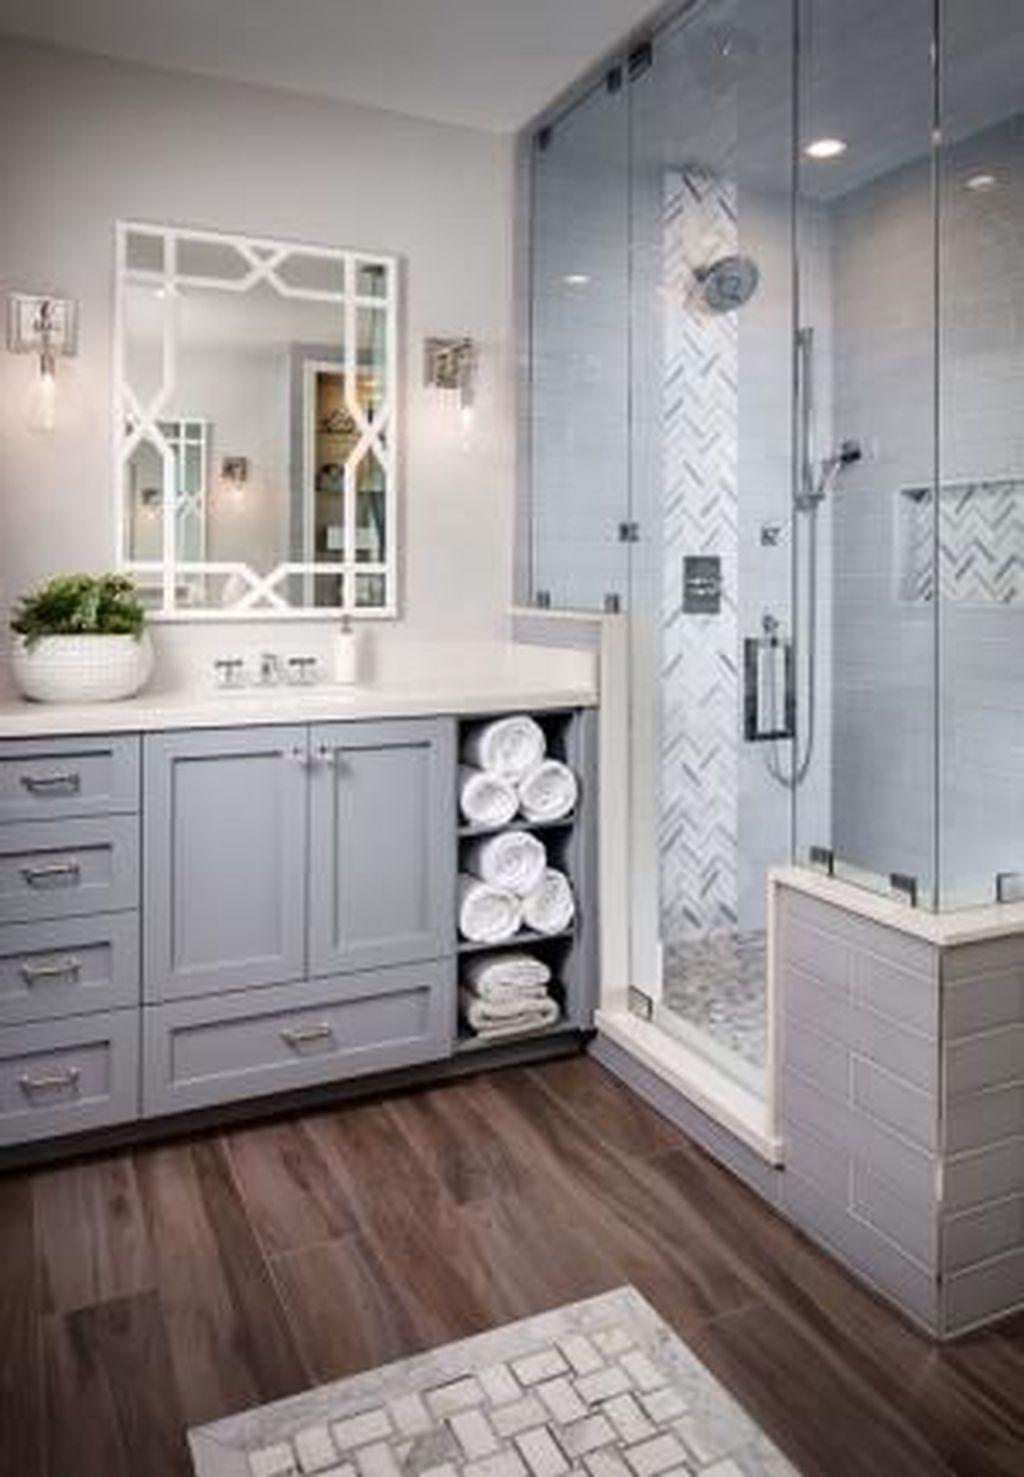 46 Popular Bathroom Mirror Design Ideas For Any Bathroom Model